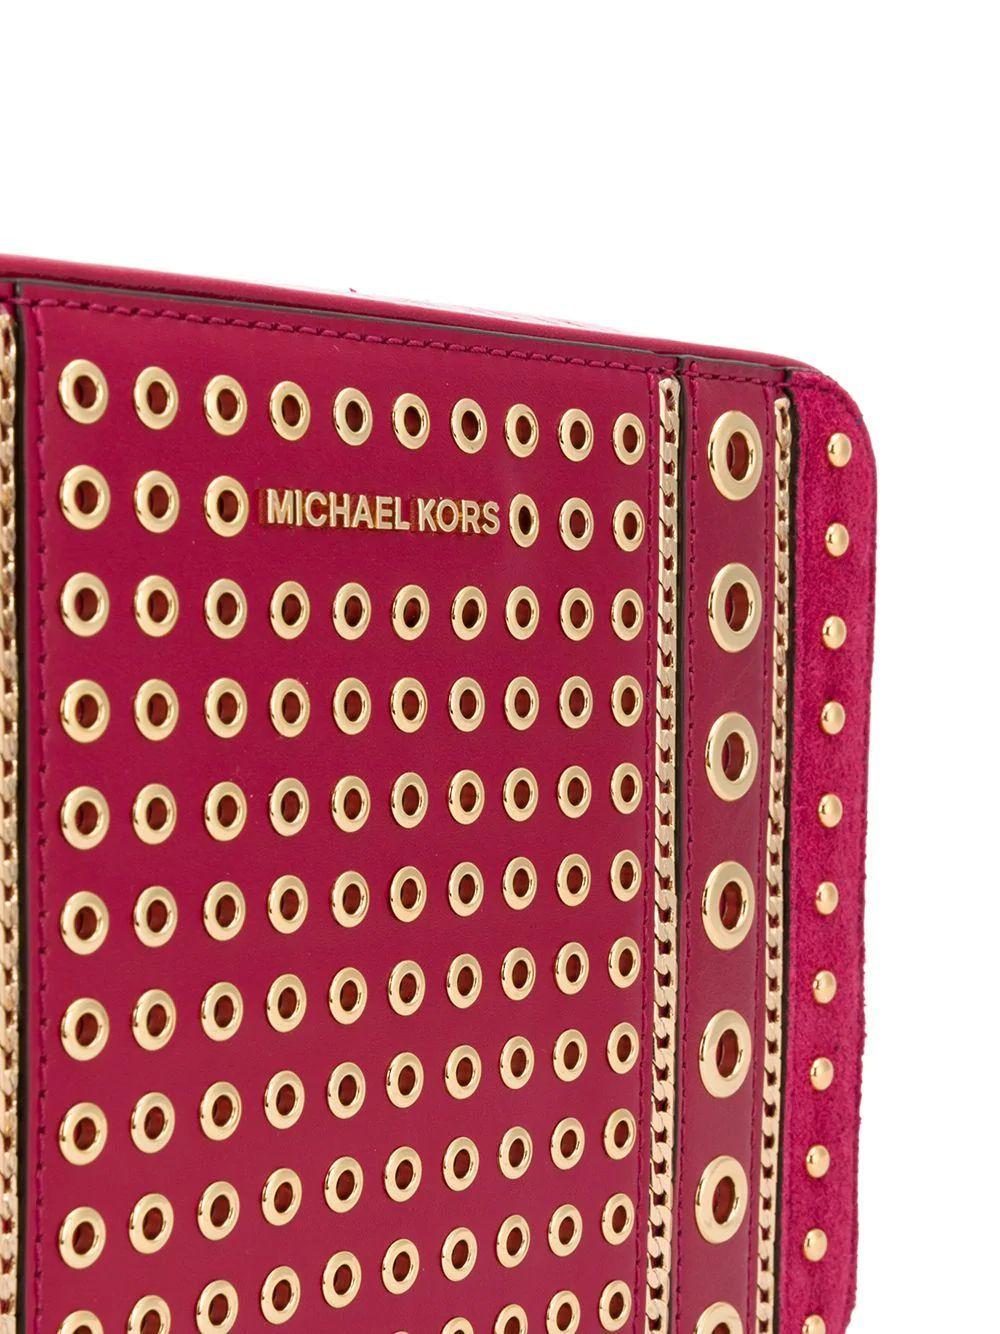 MICHAEL KORS WOMEN'S 32H9GJ6M2U506 FUCHSIA LEATHER SHOULDER BAG